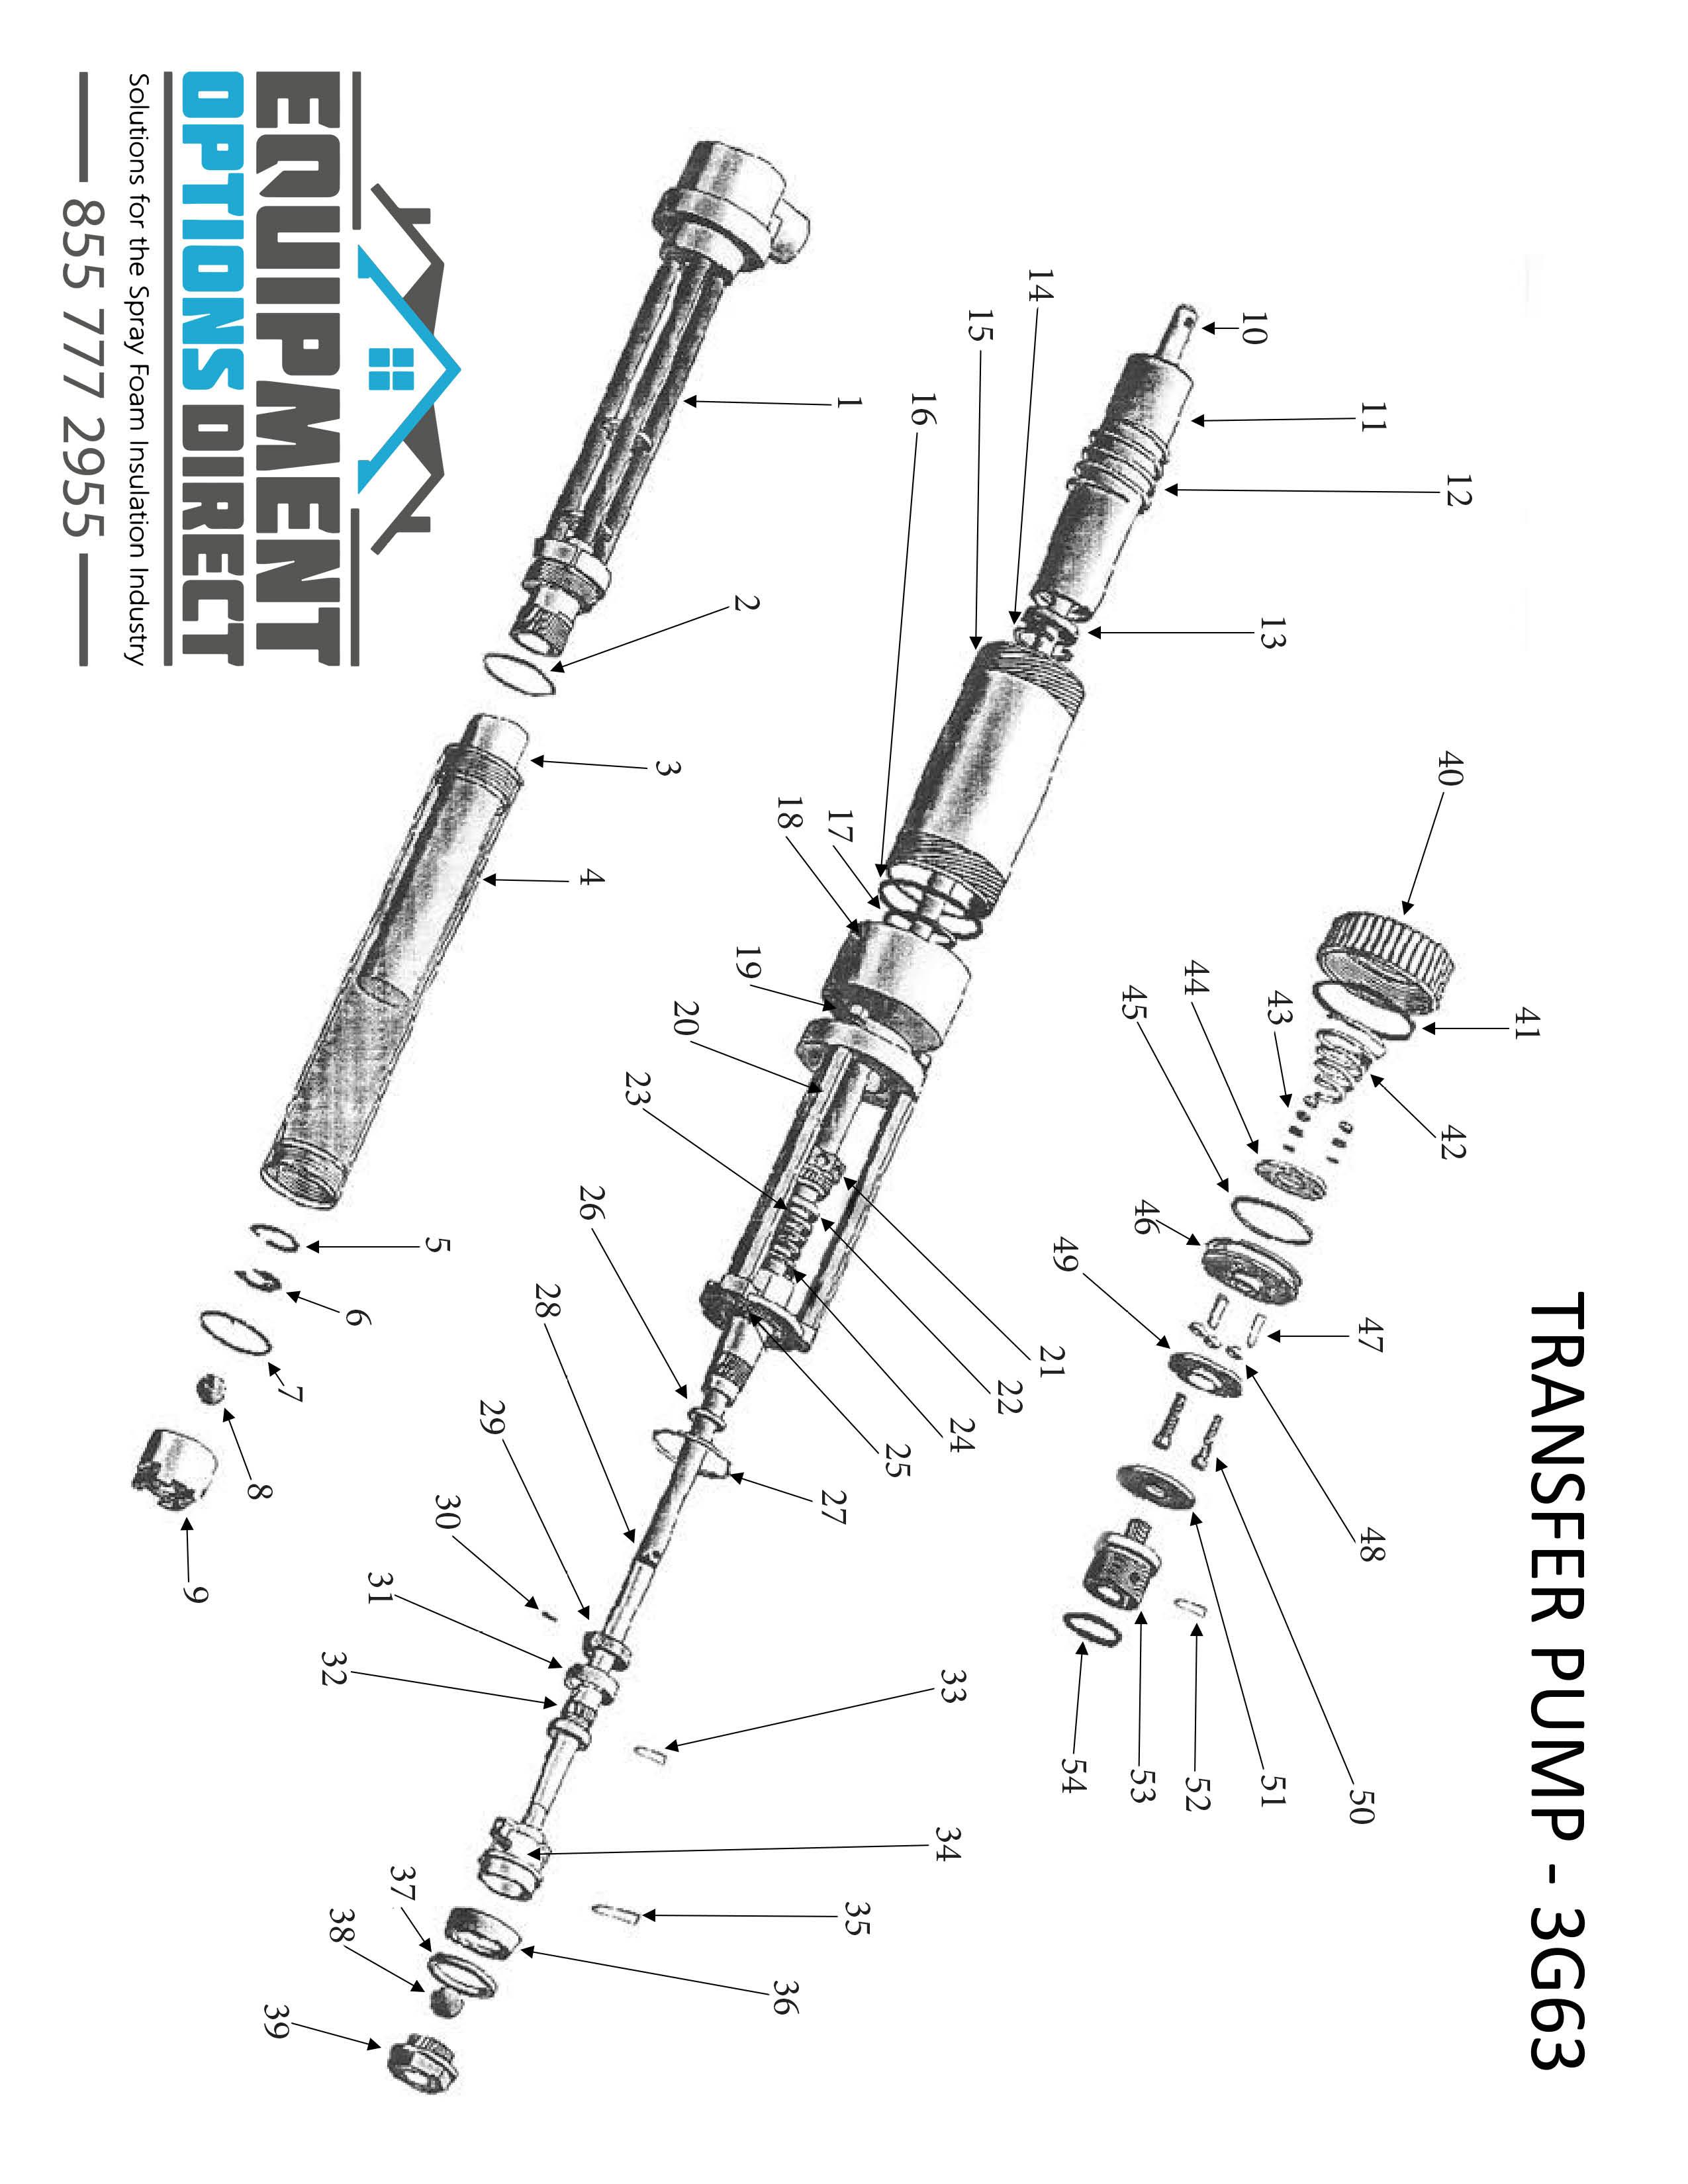 Eod Equipment Diagrams Equipment Options Direct